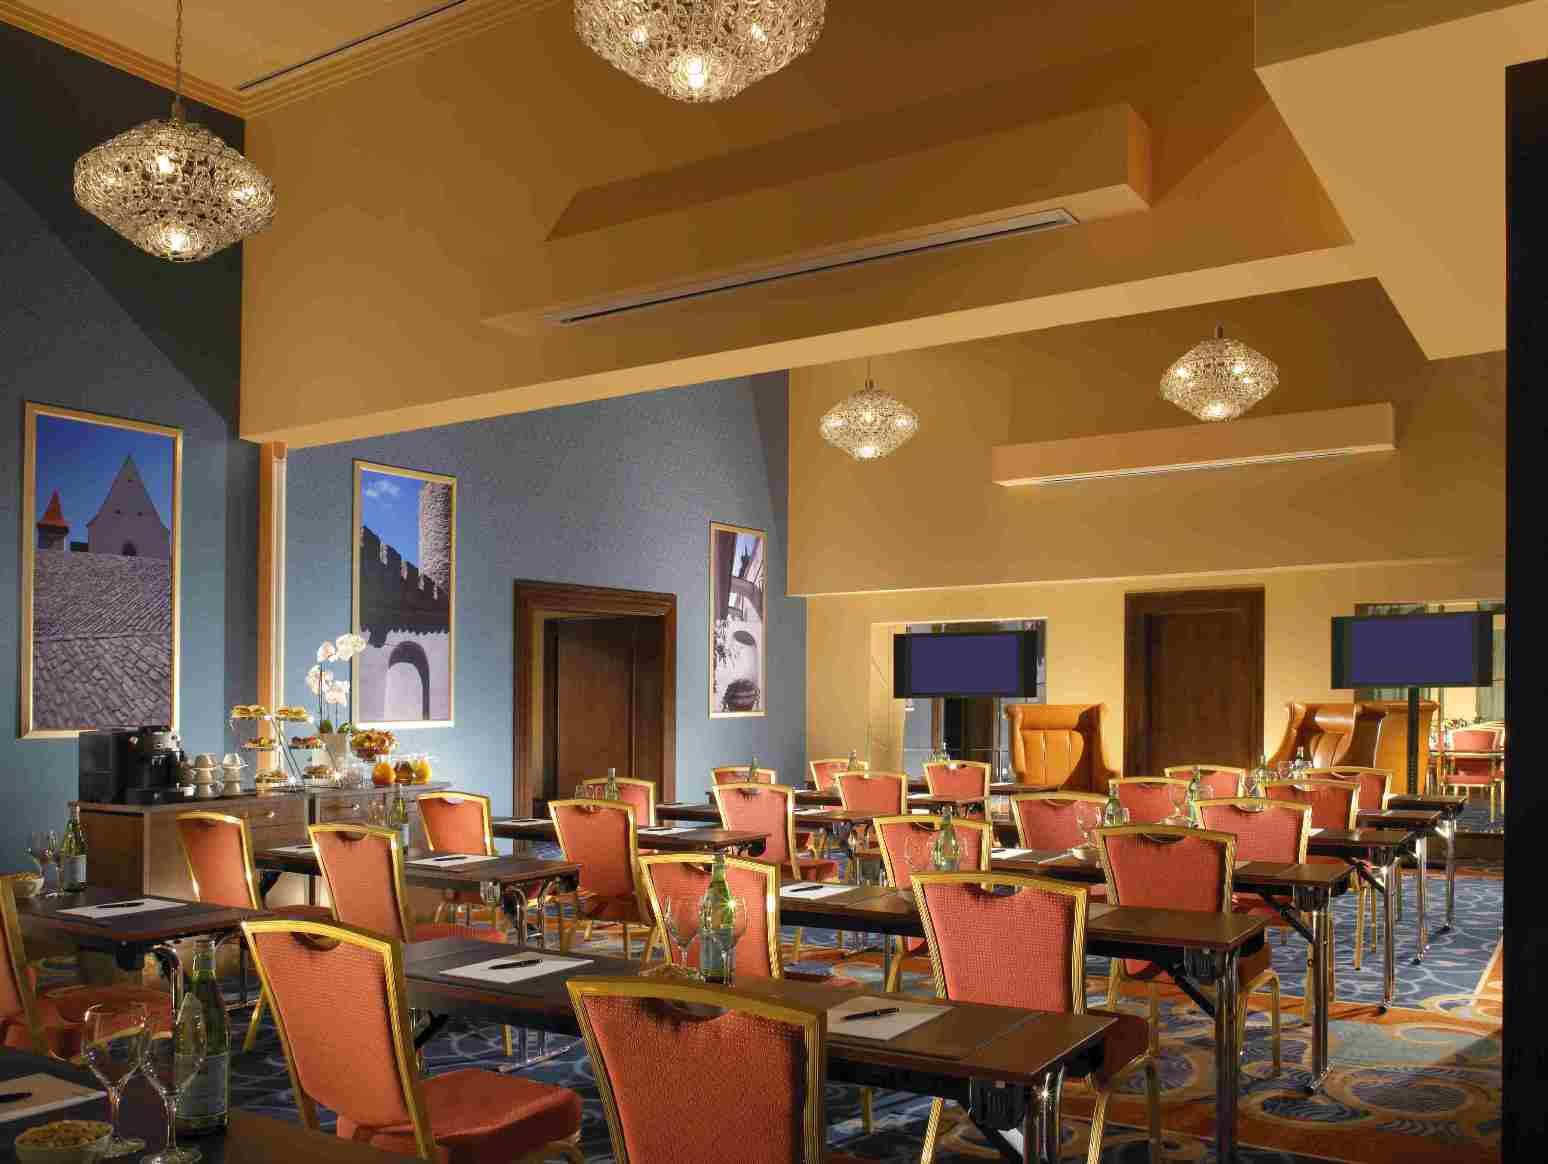 Hotel Savannah - gastronomické služby, foto Hotel Savannah